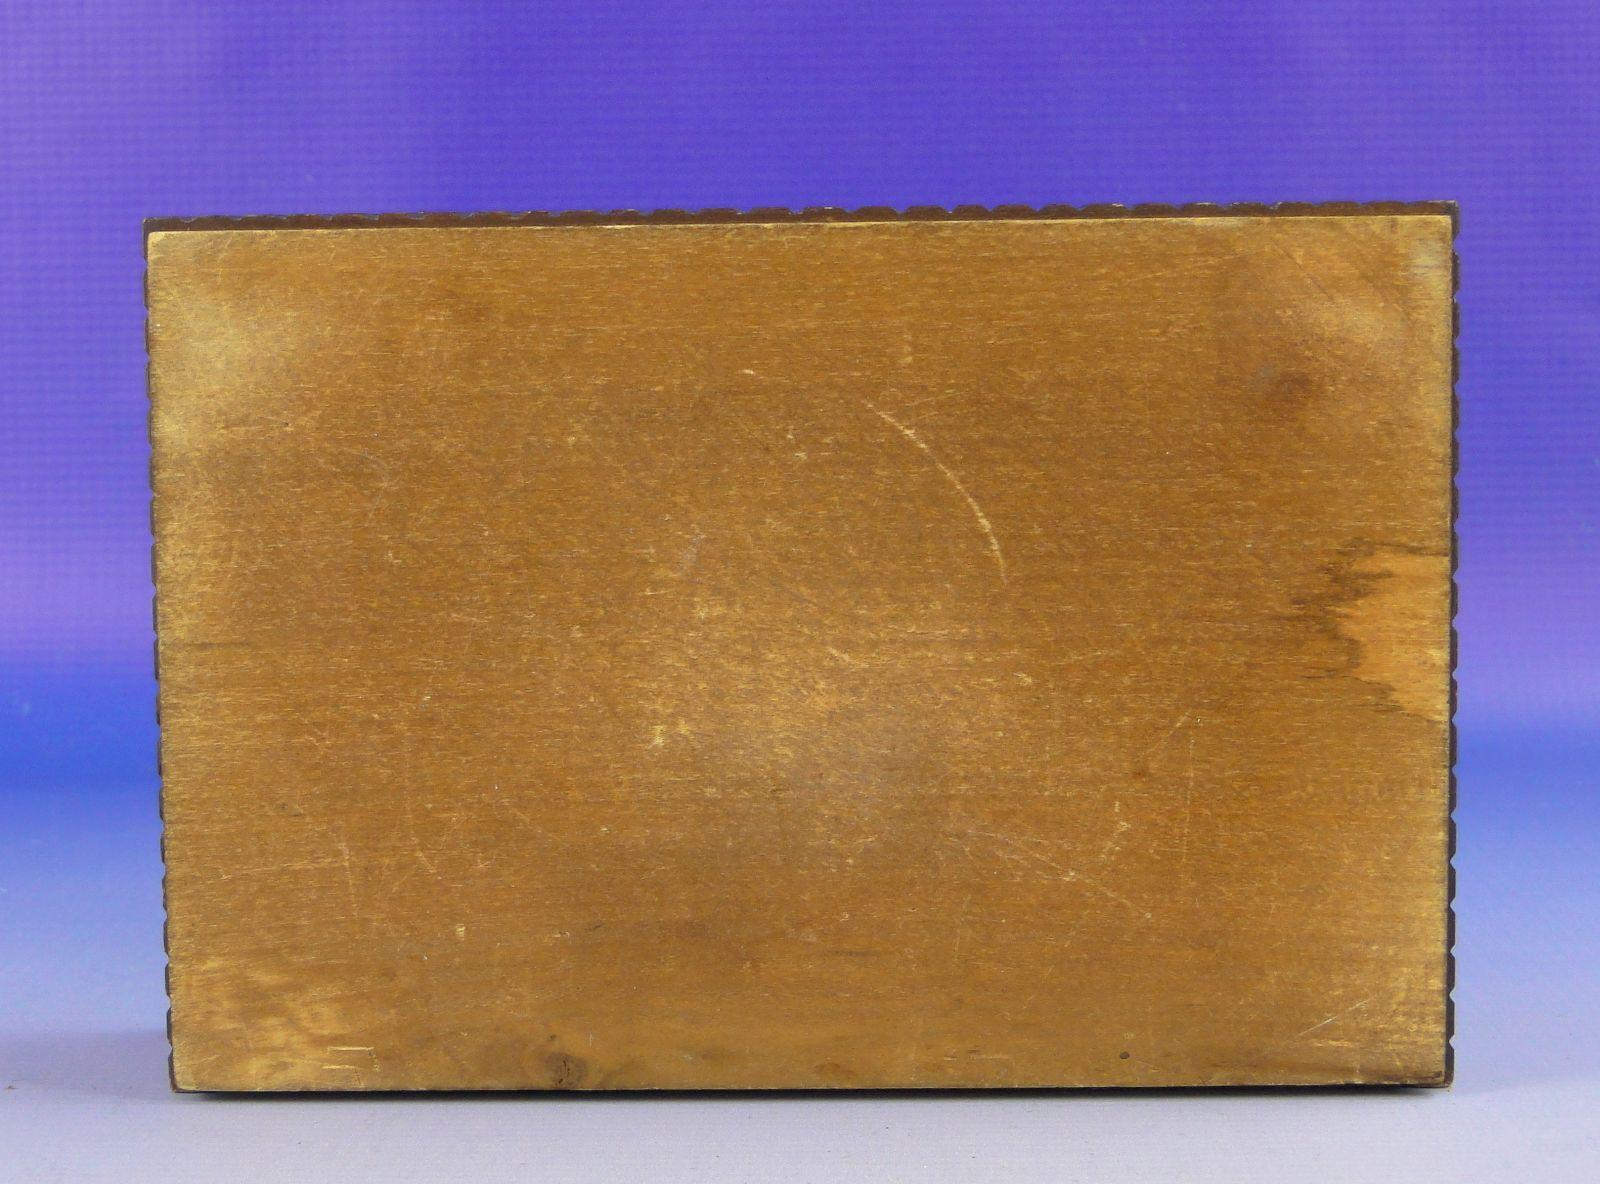 DSC09544.JPG (1600×1184)